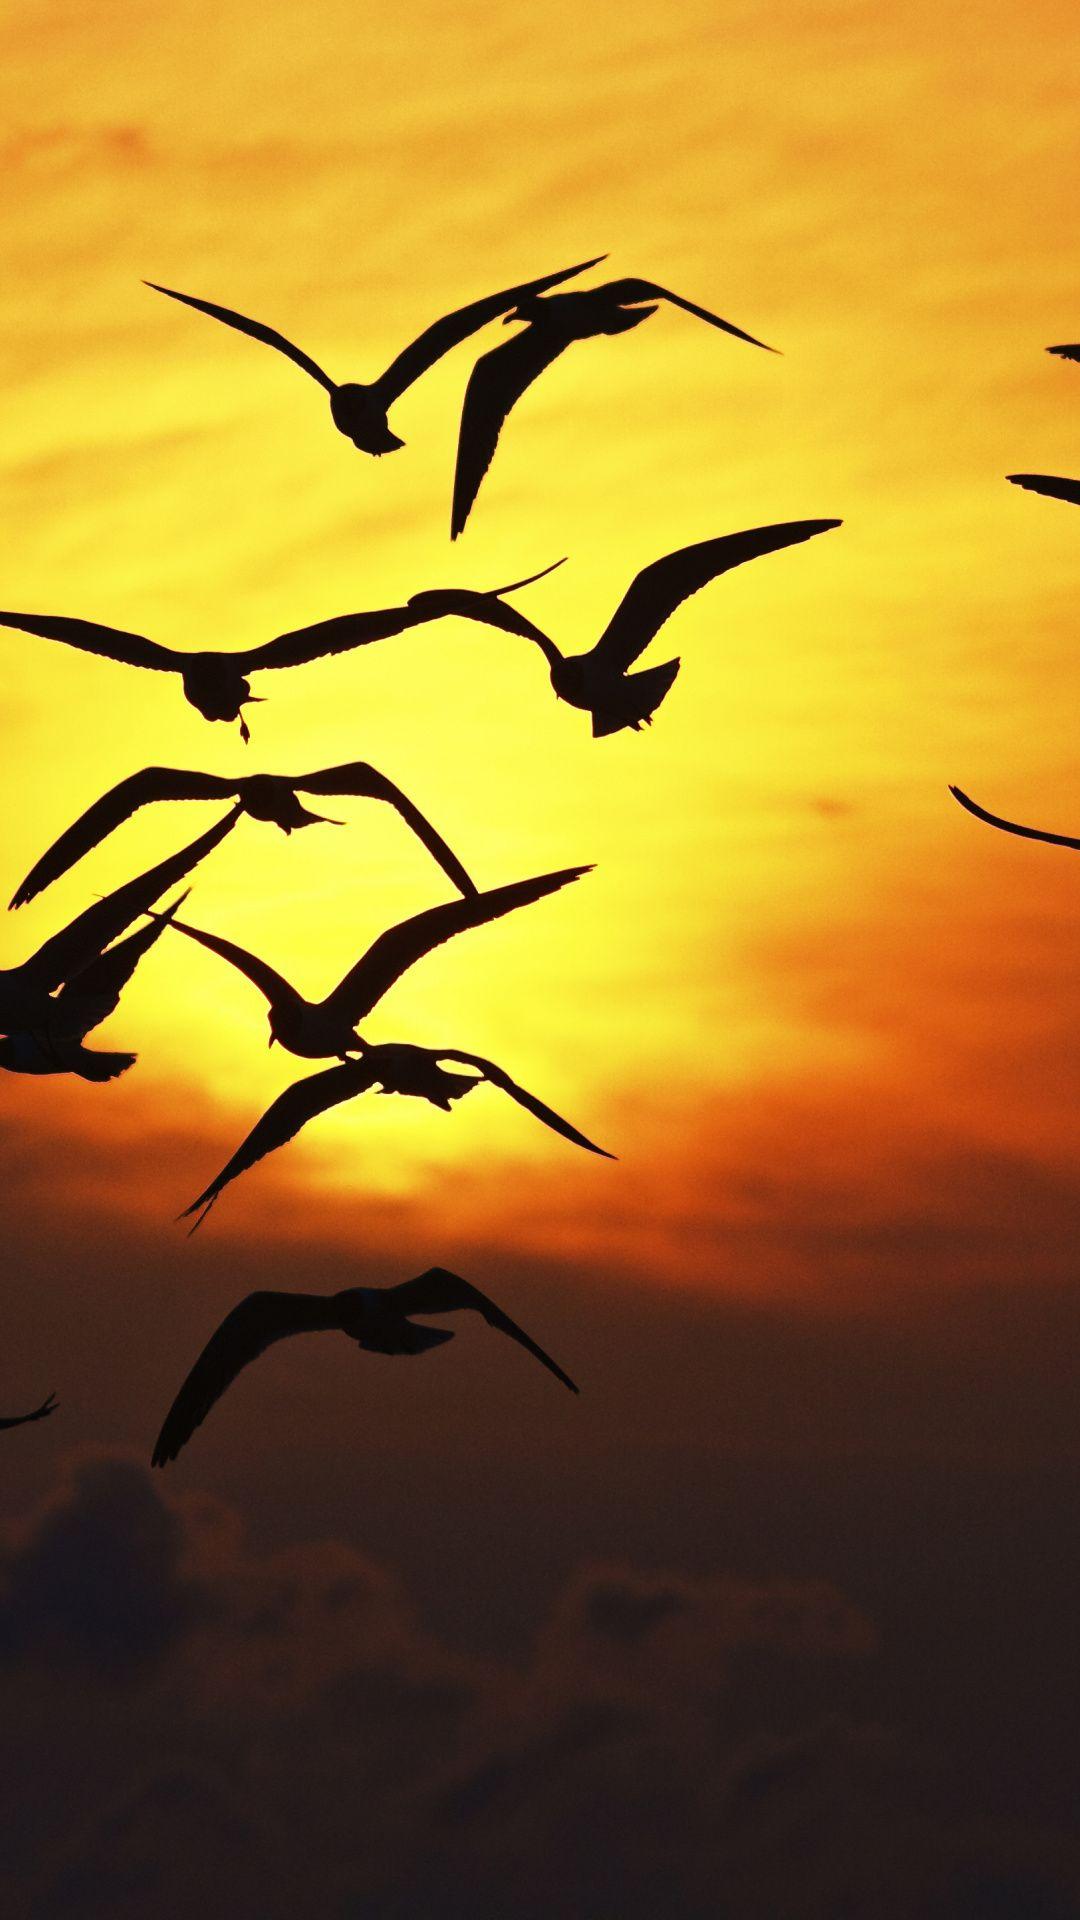 1080x1920 Birds Sunset Sky Silhouette Wallpaper Yellow Sky Sunset Silhouette Moon Photography